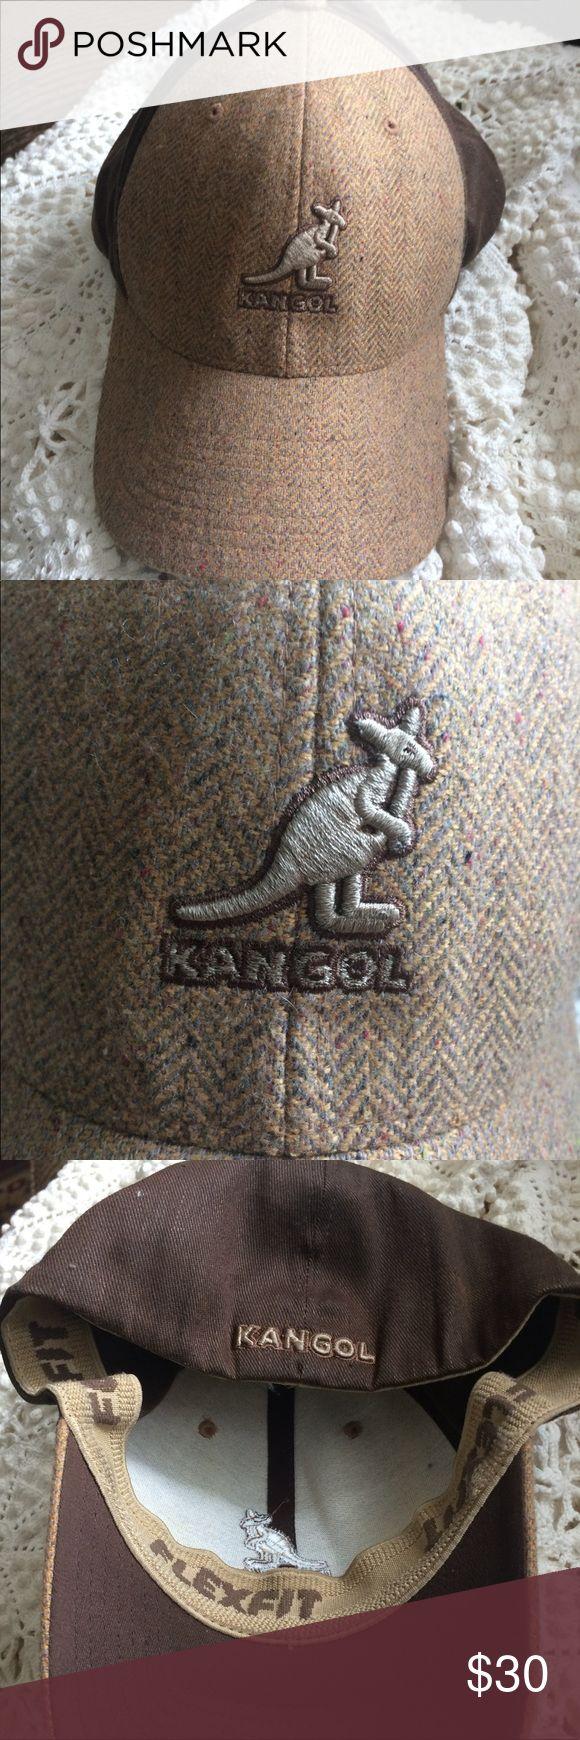 Kangol Baseball Cap Kangol Flexfit Fit Herringbone Baseball Cap.    Size  L/XL. Used but good condition. This hat is unisex. Kangol Accessories Hats